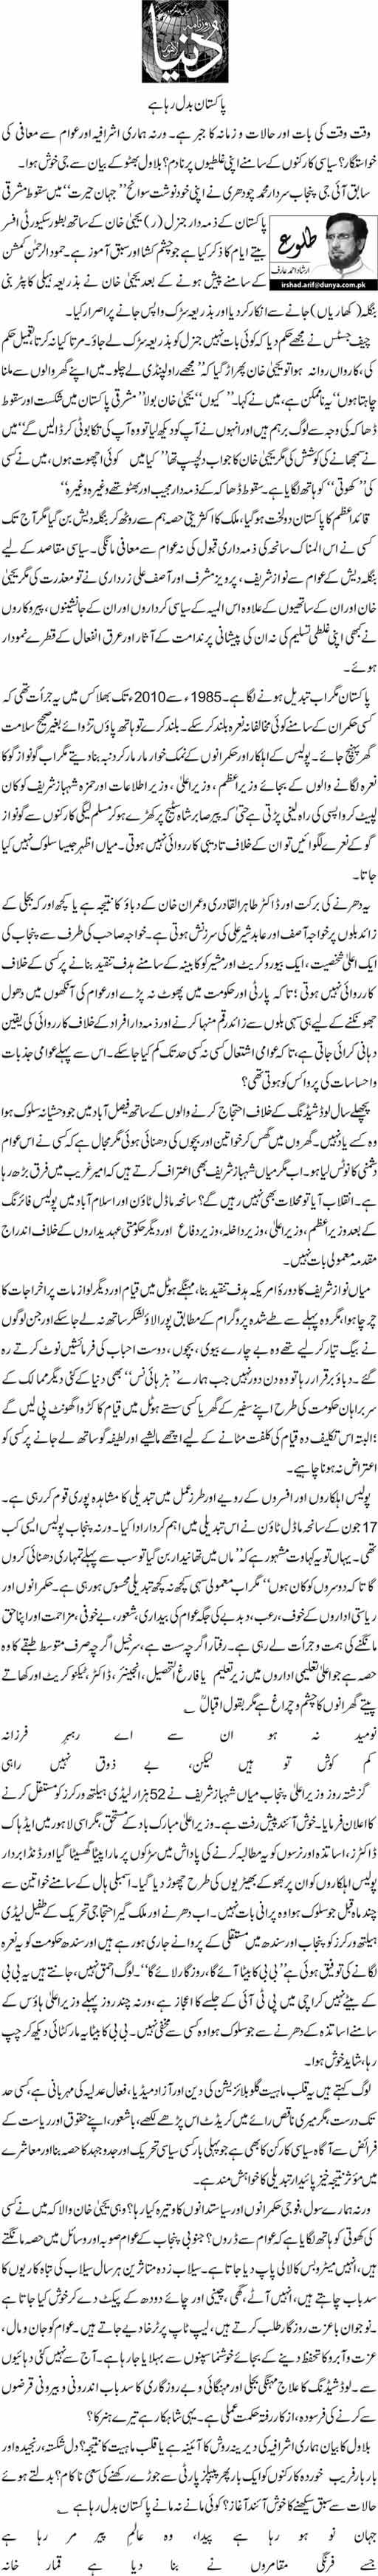 Print Media Coverage Daily Dunya - Irshad Ahmad Arif